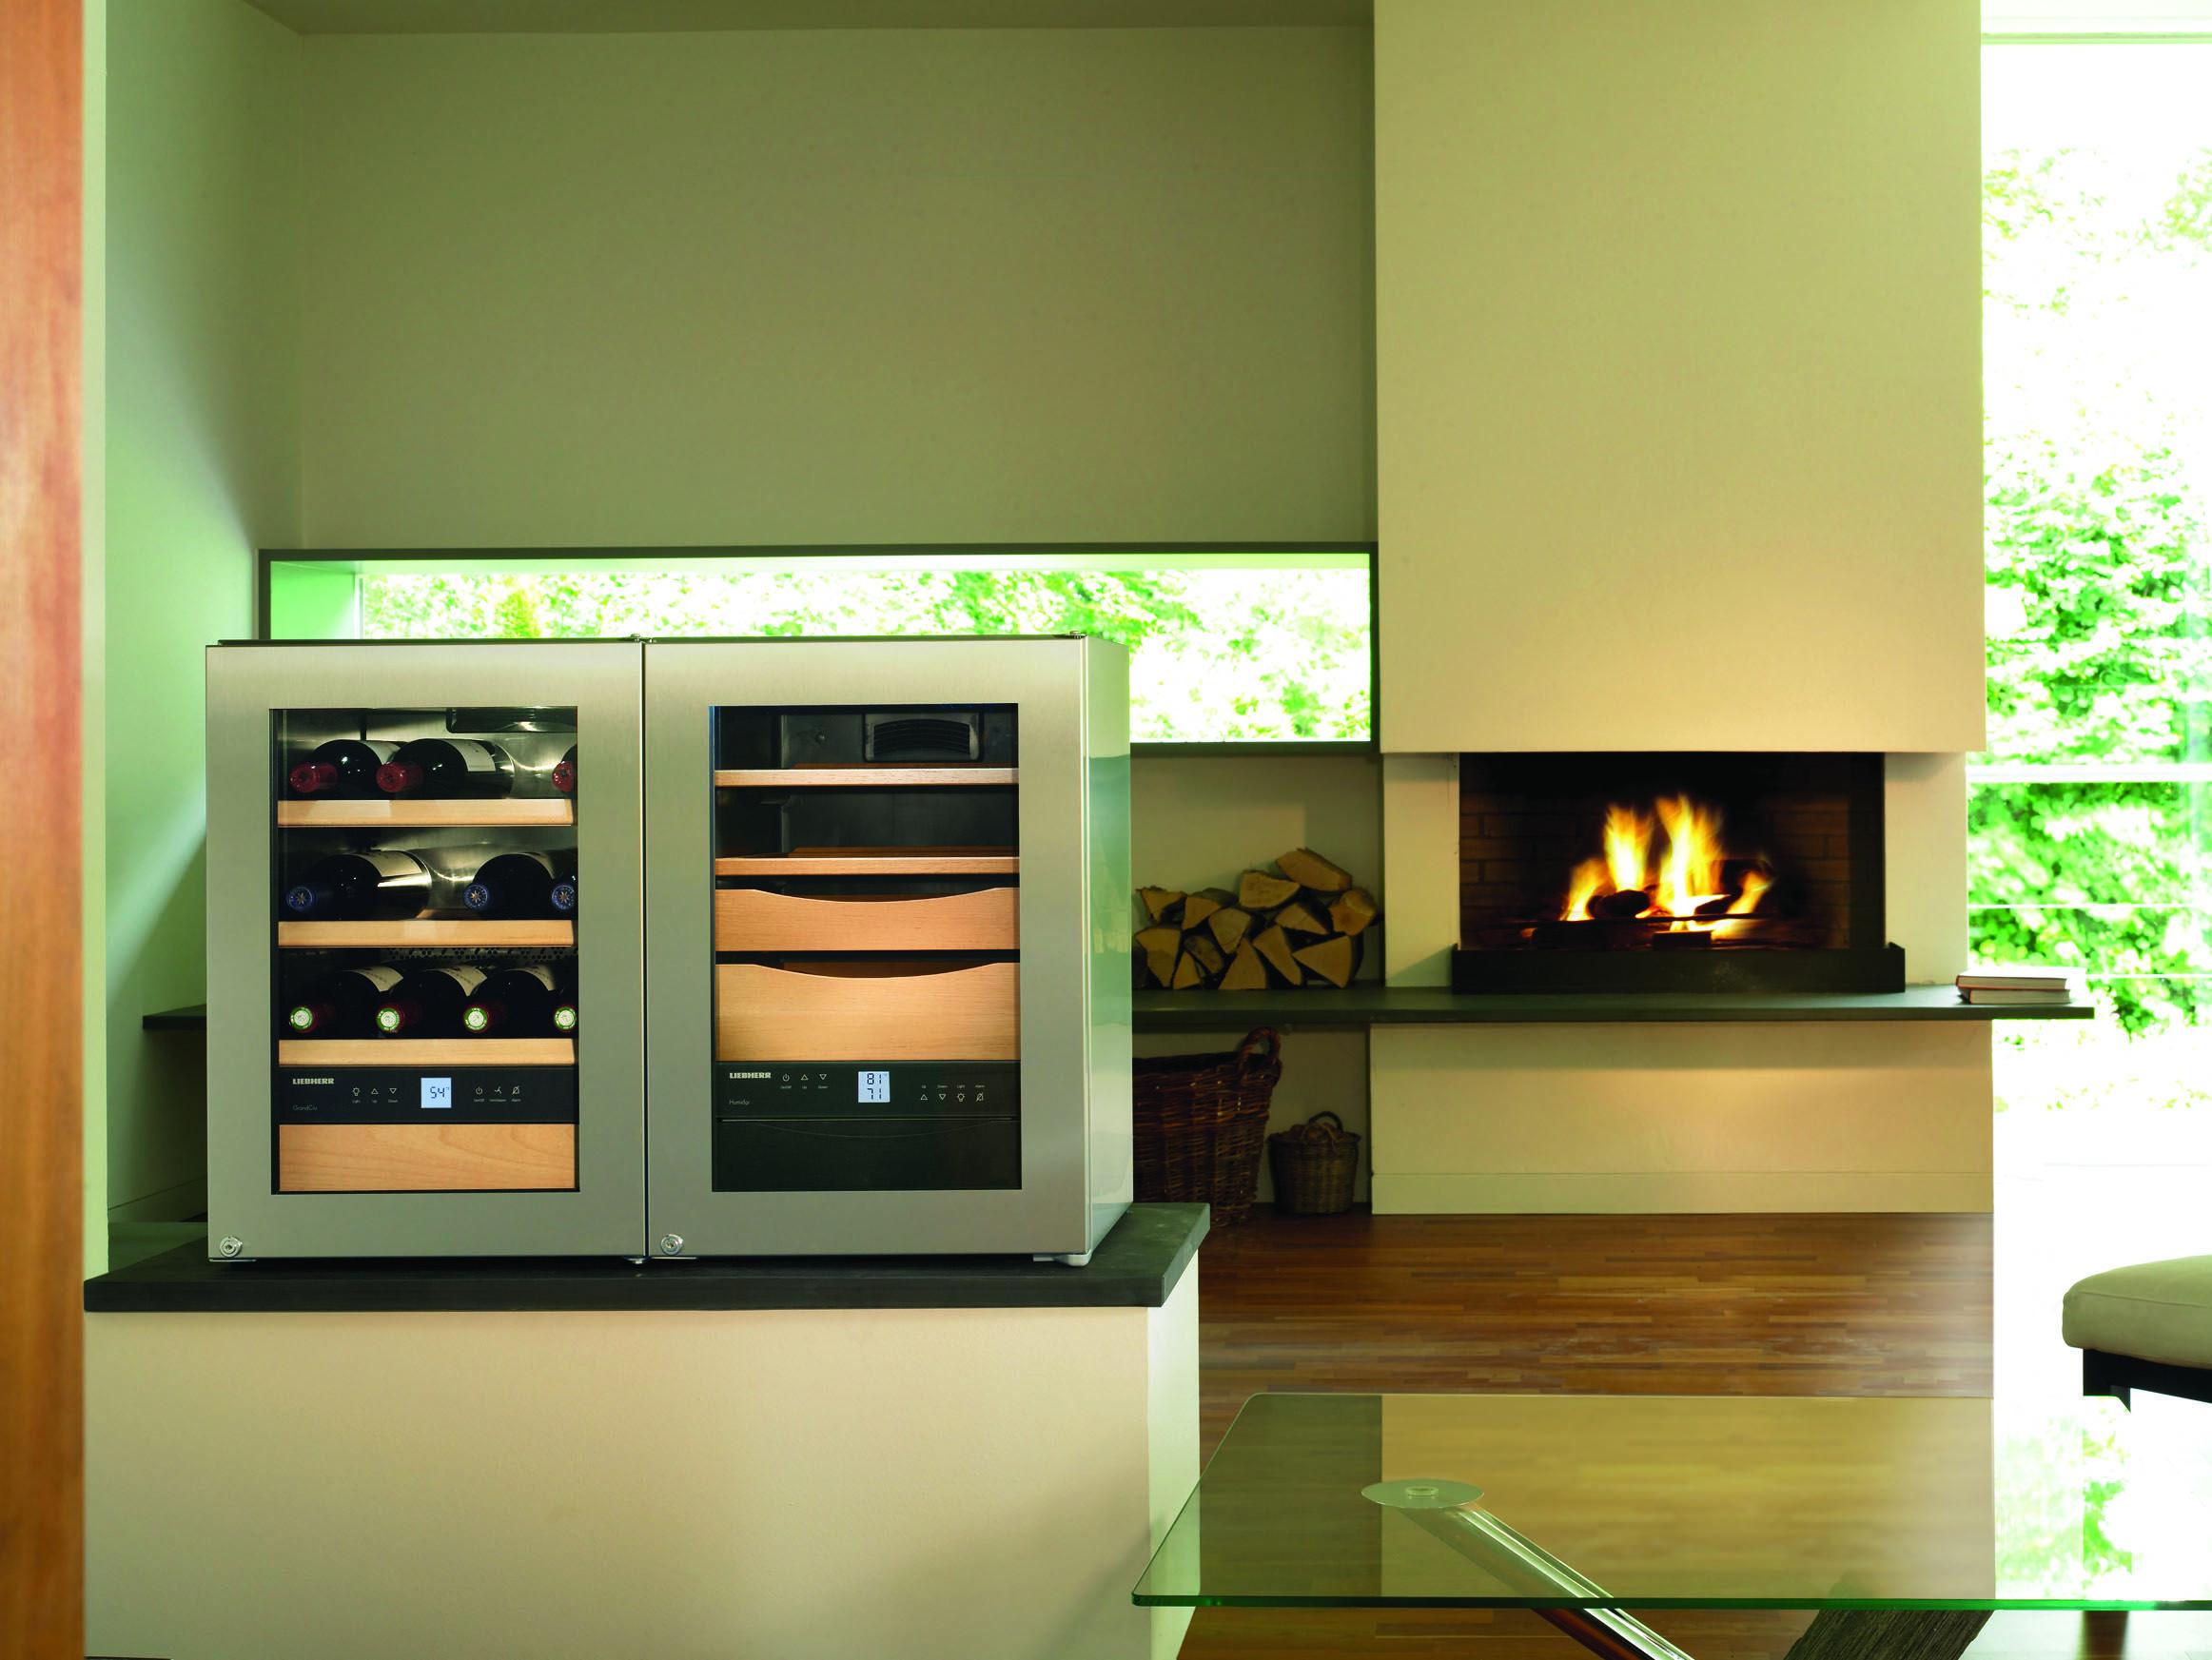 17 Wine Cabinet Humidor Liebherr Ws 1200 Liebherr Xs 200 Wine Cabinets Integrated Fridge Interior Design